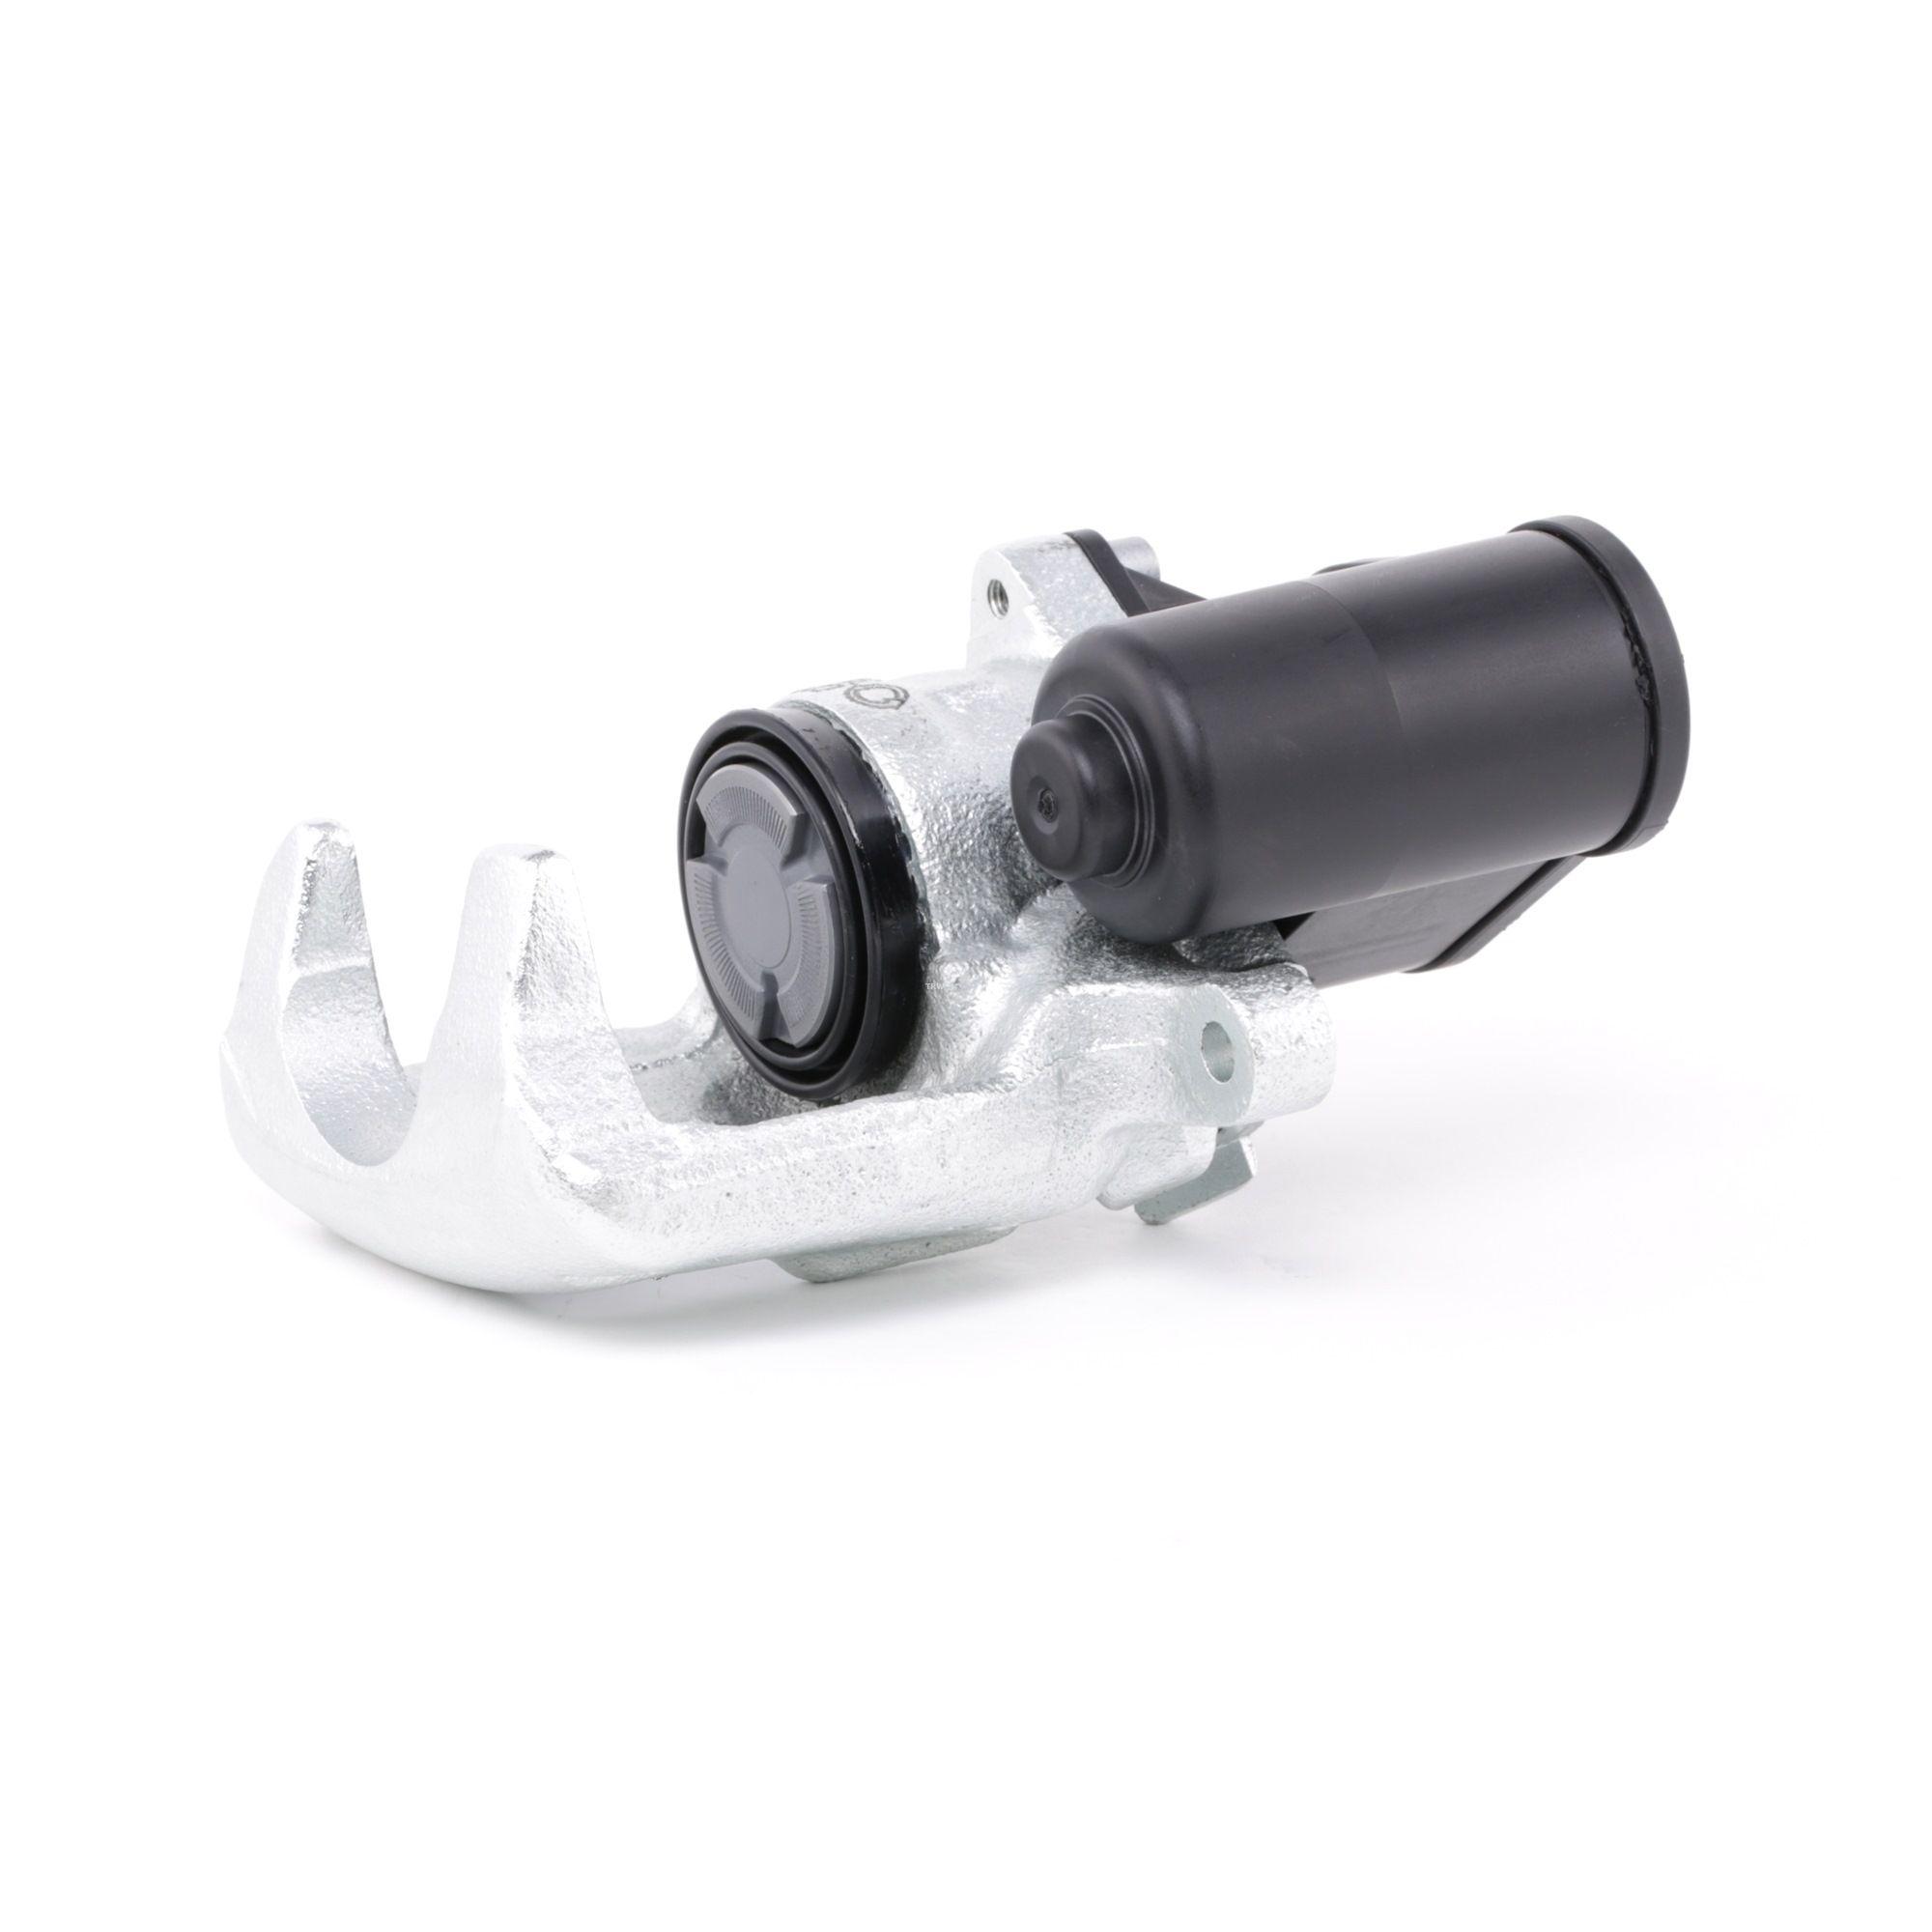 Acheter Étrier de frein Ø: 41mm, Ø: 41mm TRW BHN962E à tout moment